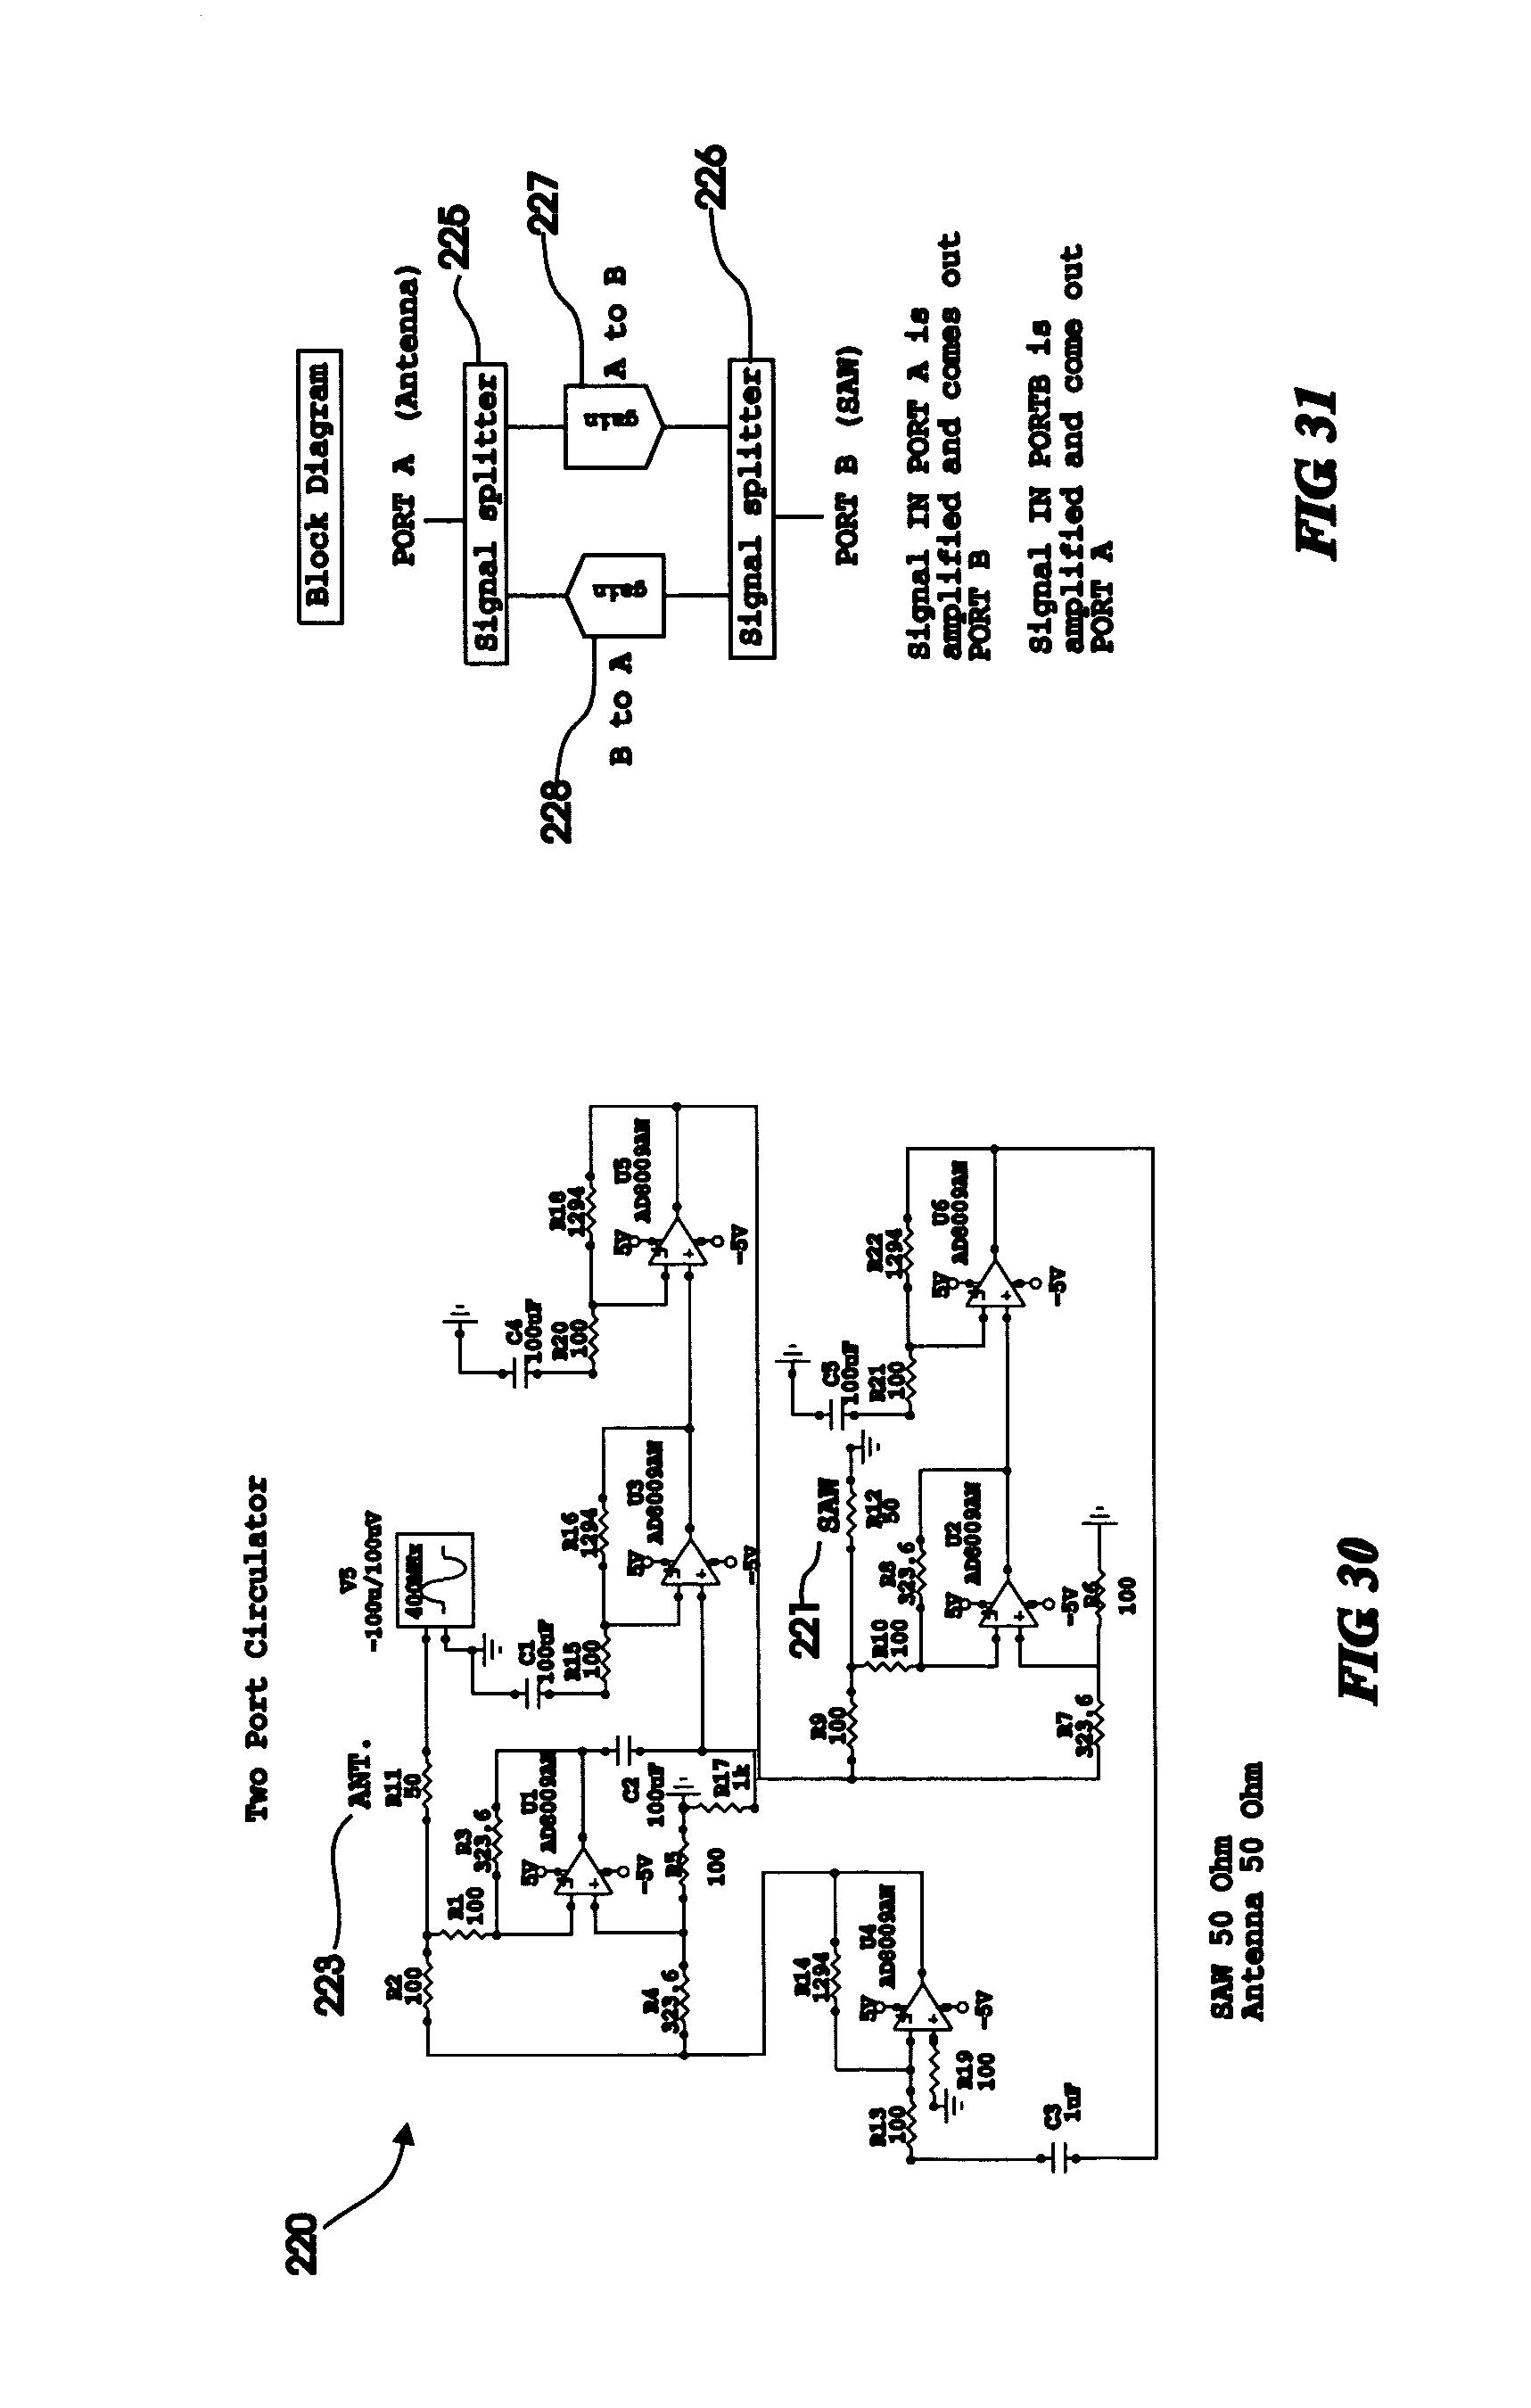 Patent Us 7421321 B2 Atlas Traps Wiring Diagram Images